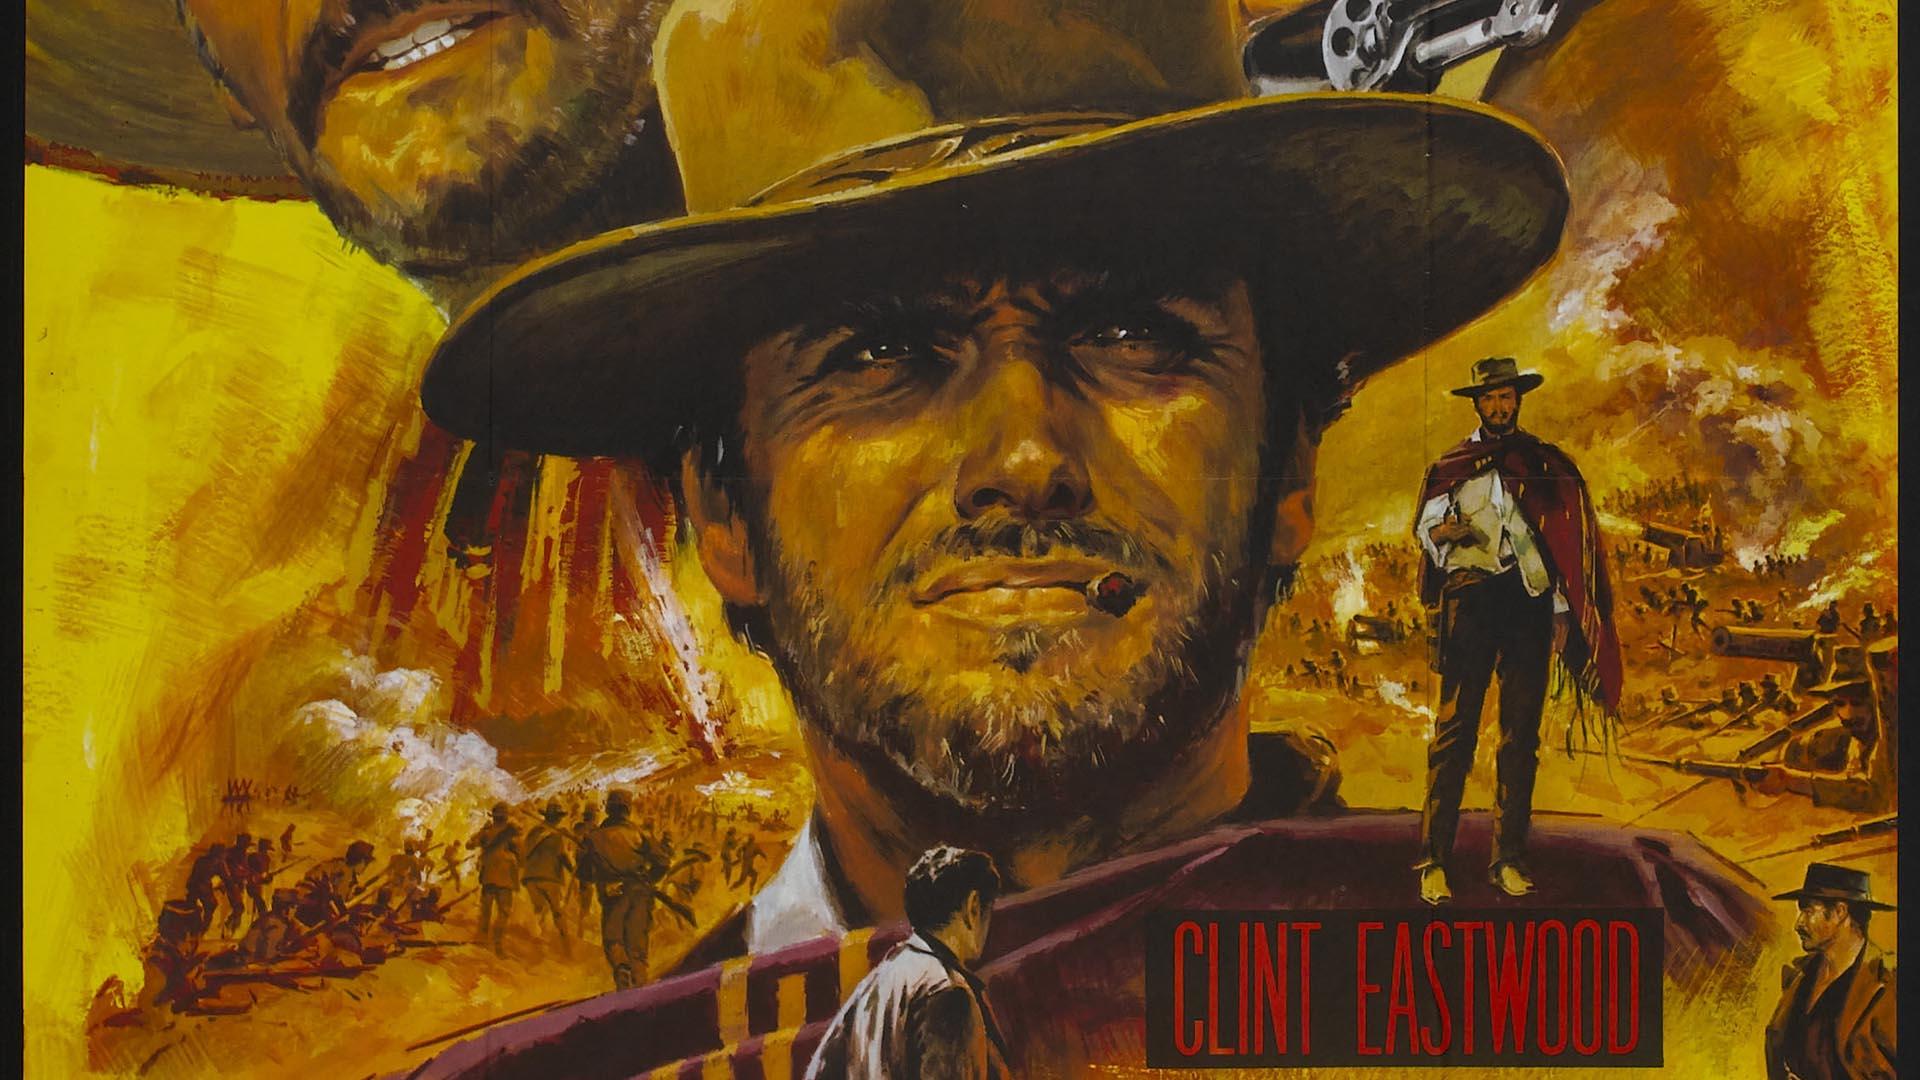 Classic Movie Poster Wallpaper - WallpaperSafari Hd Wallpaper 1920x1080 Of Movies